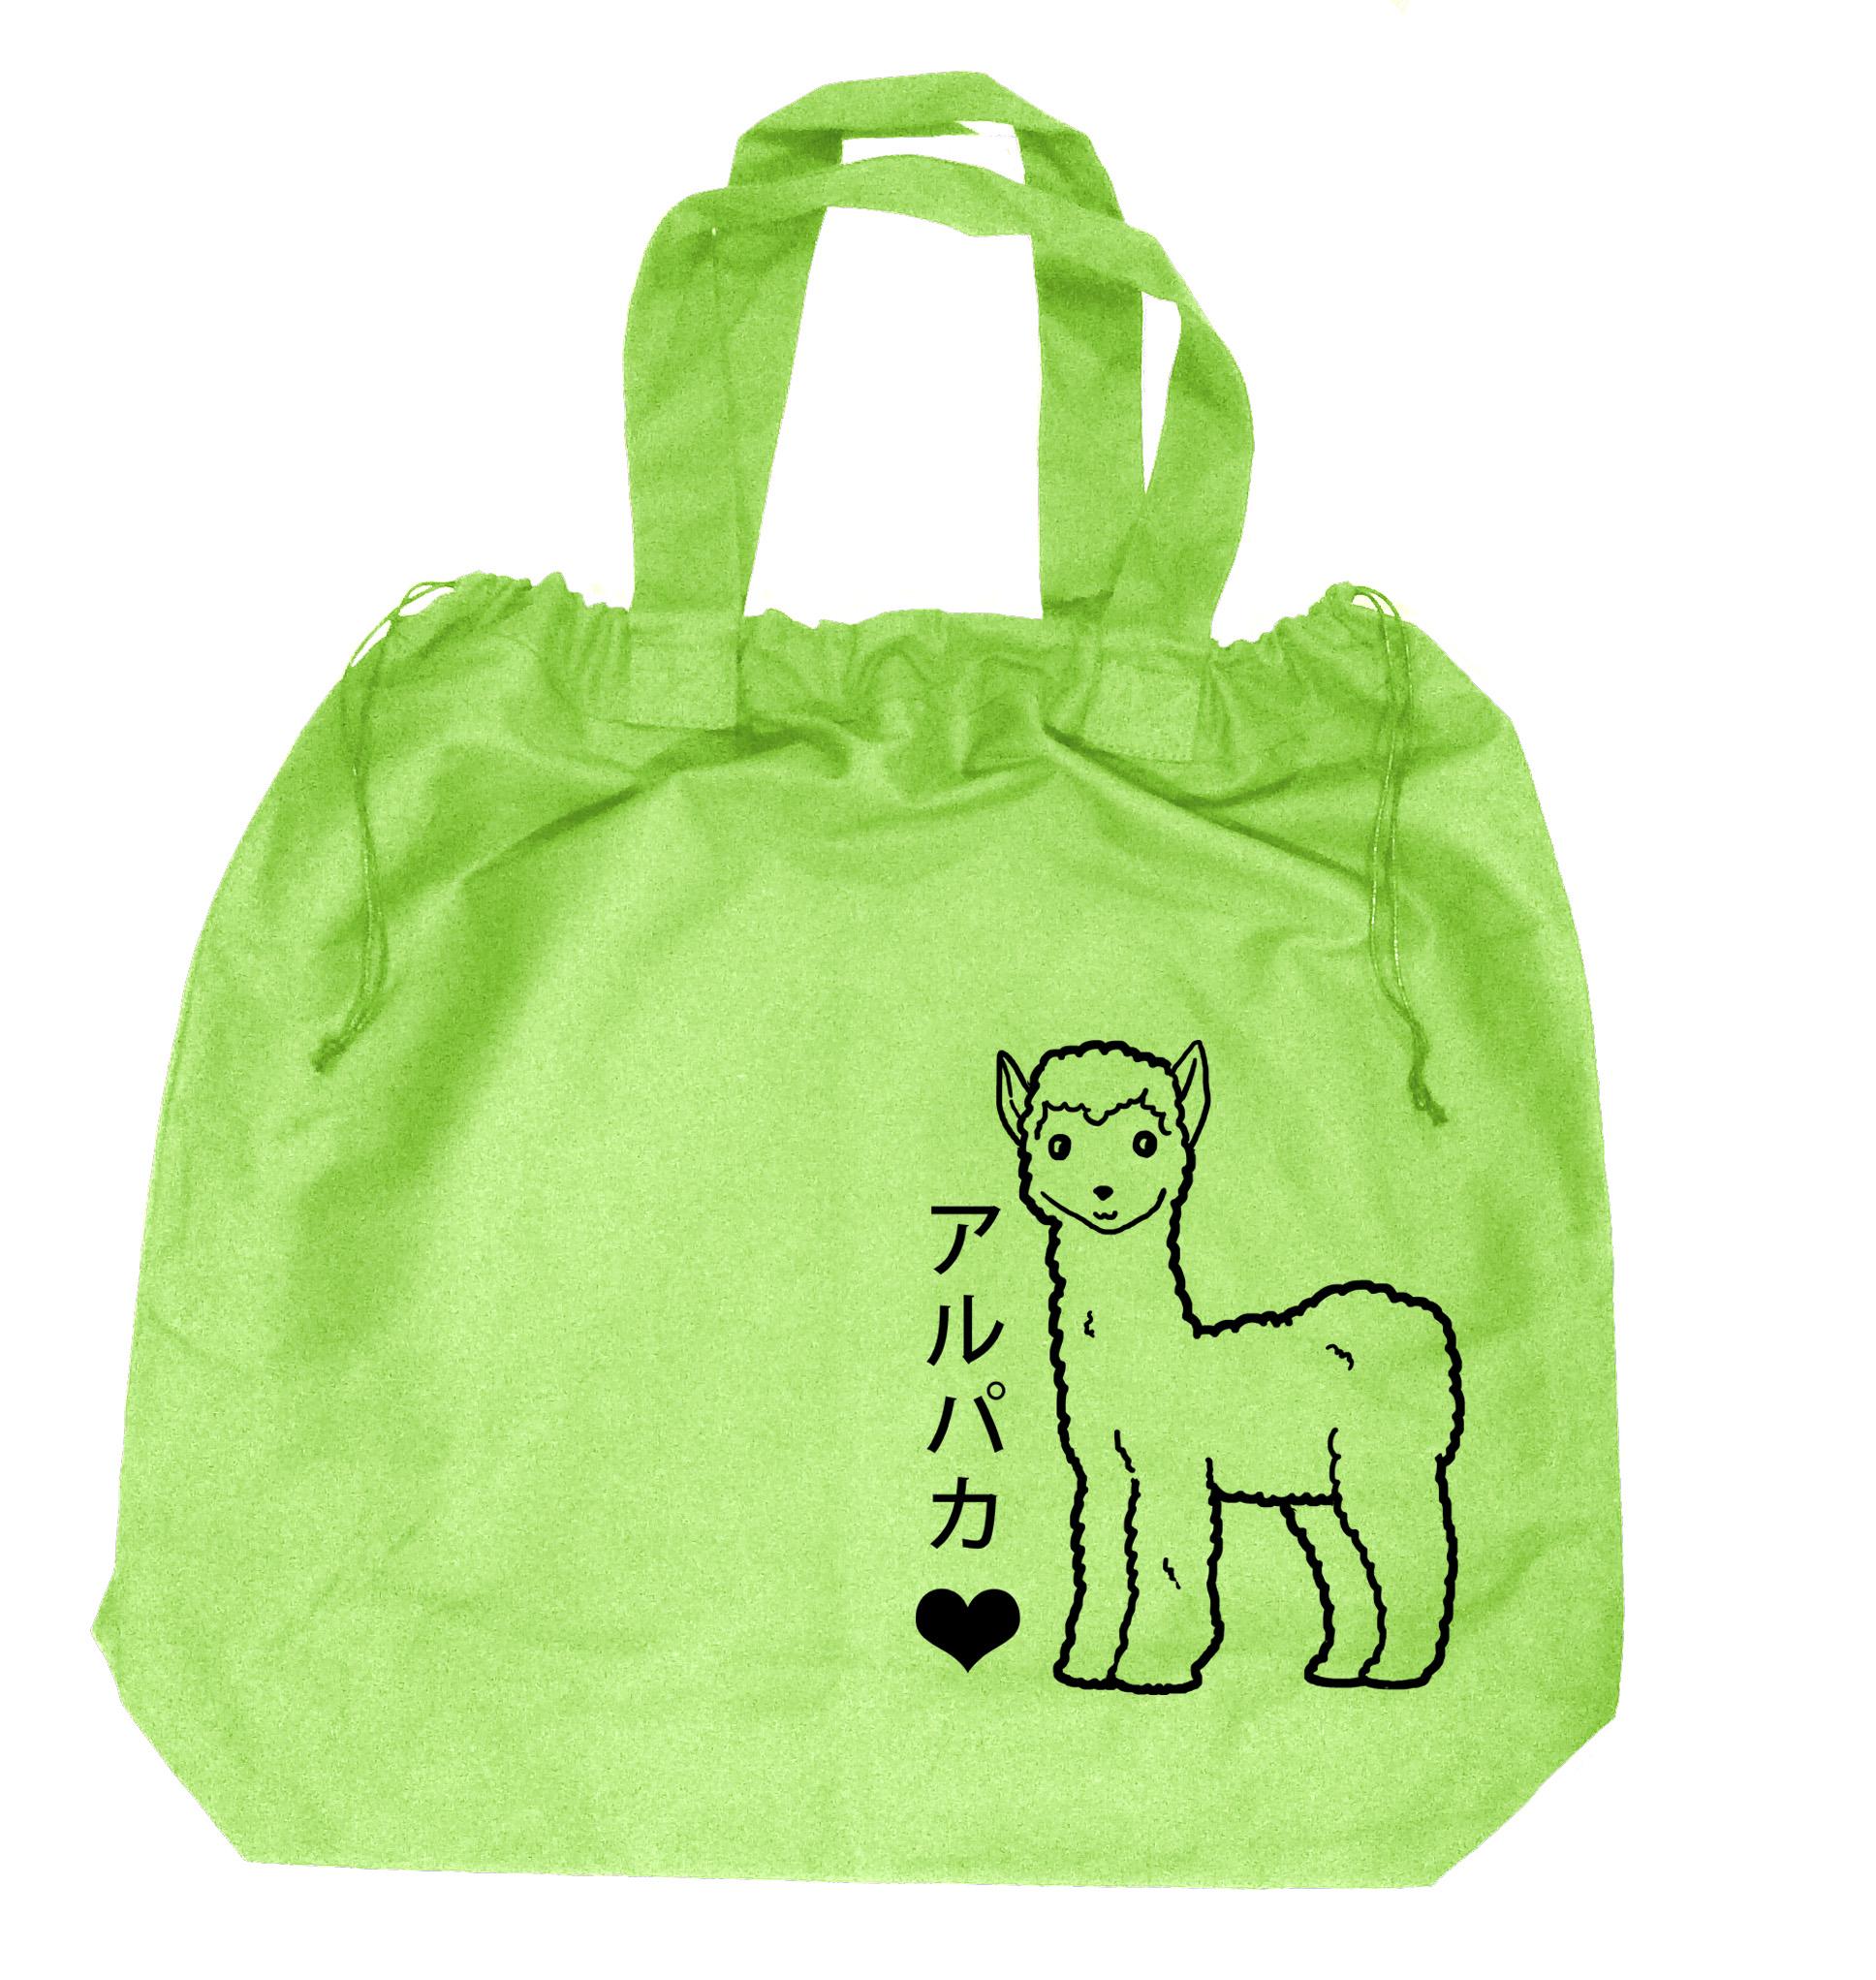 alpaca love extra large drawstring beach tote alpaca beach bag